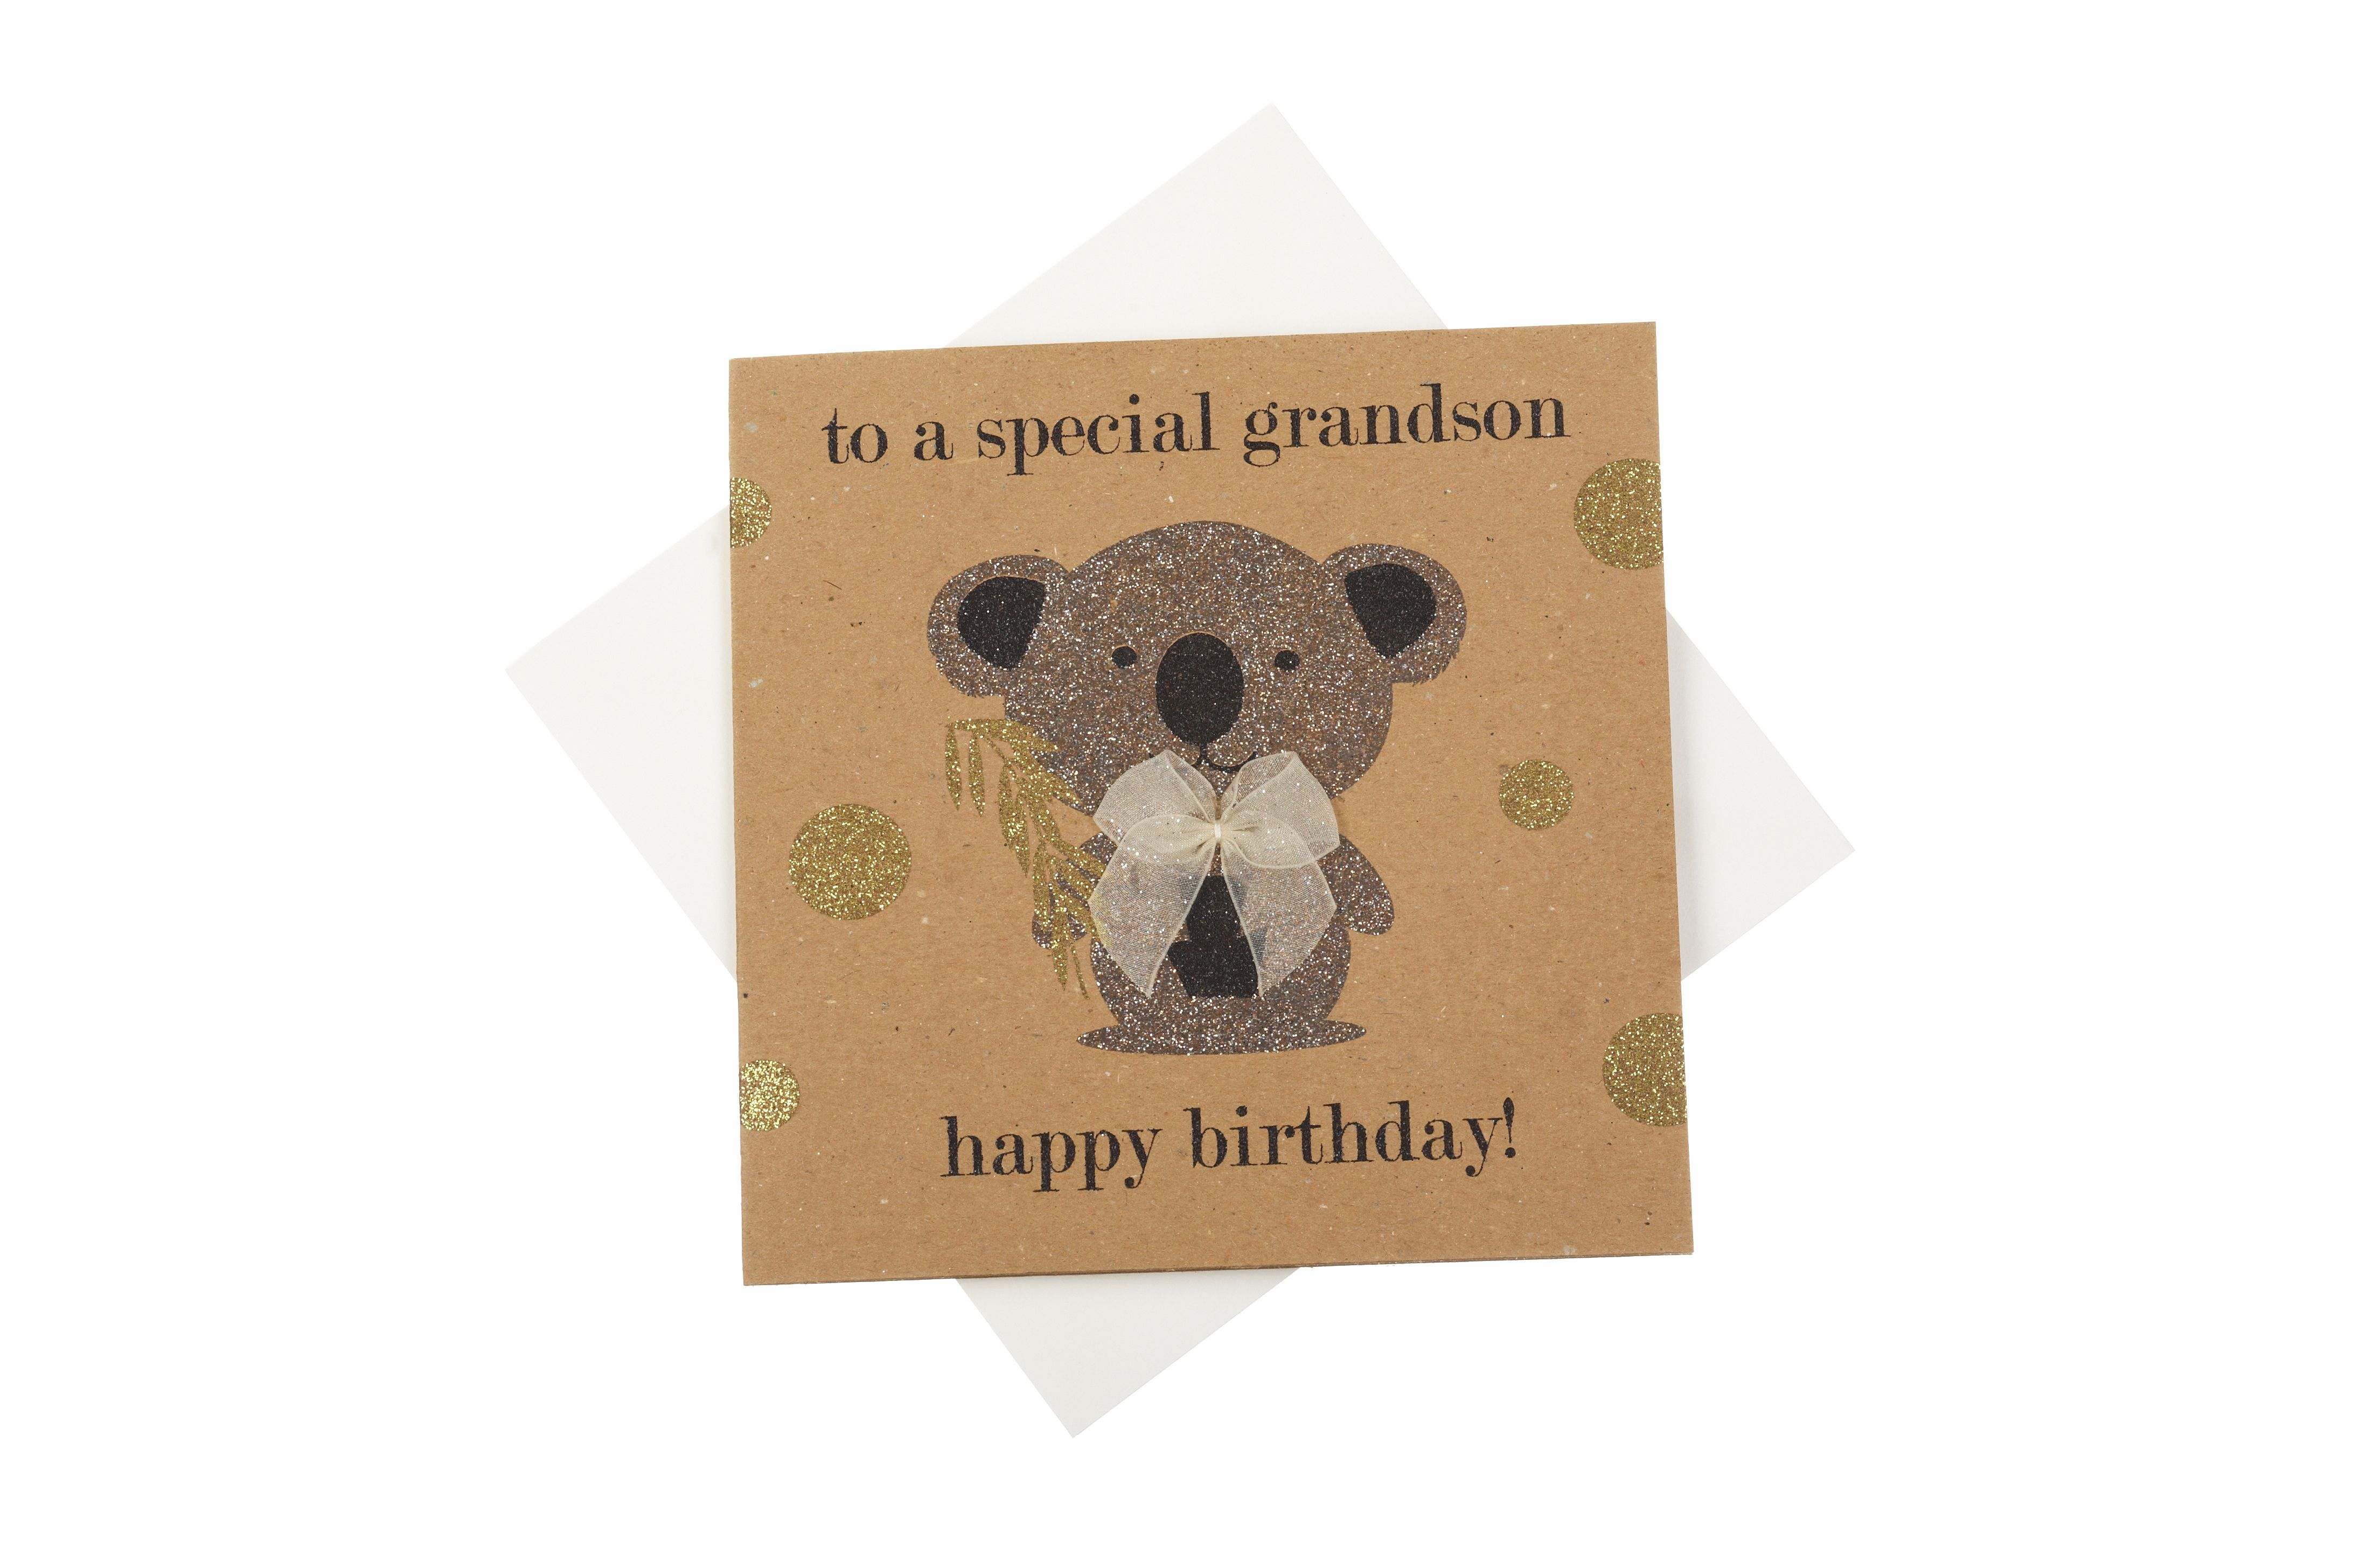 Five Dollar Shake Grandson Birthday Card House Of Rokoko Grandson Birthday Cards Grandson Birthday Card Making Birthday